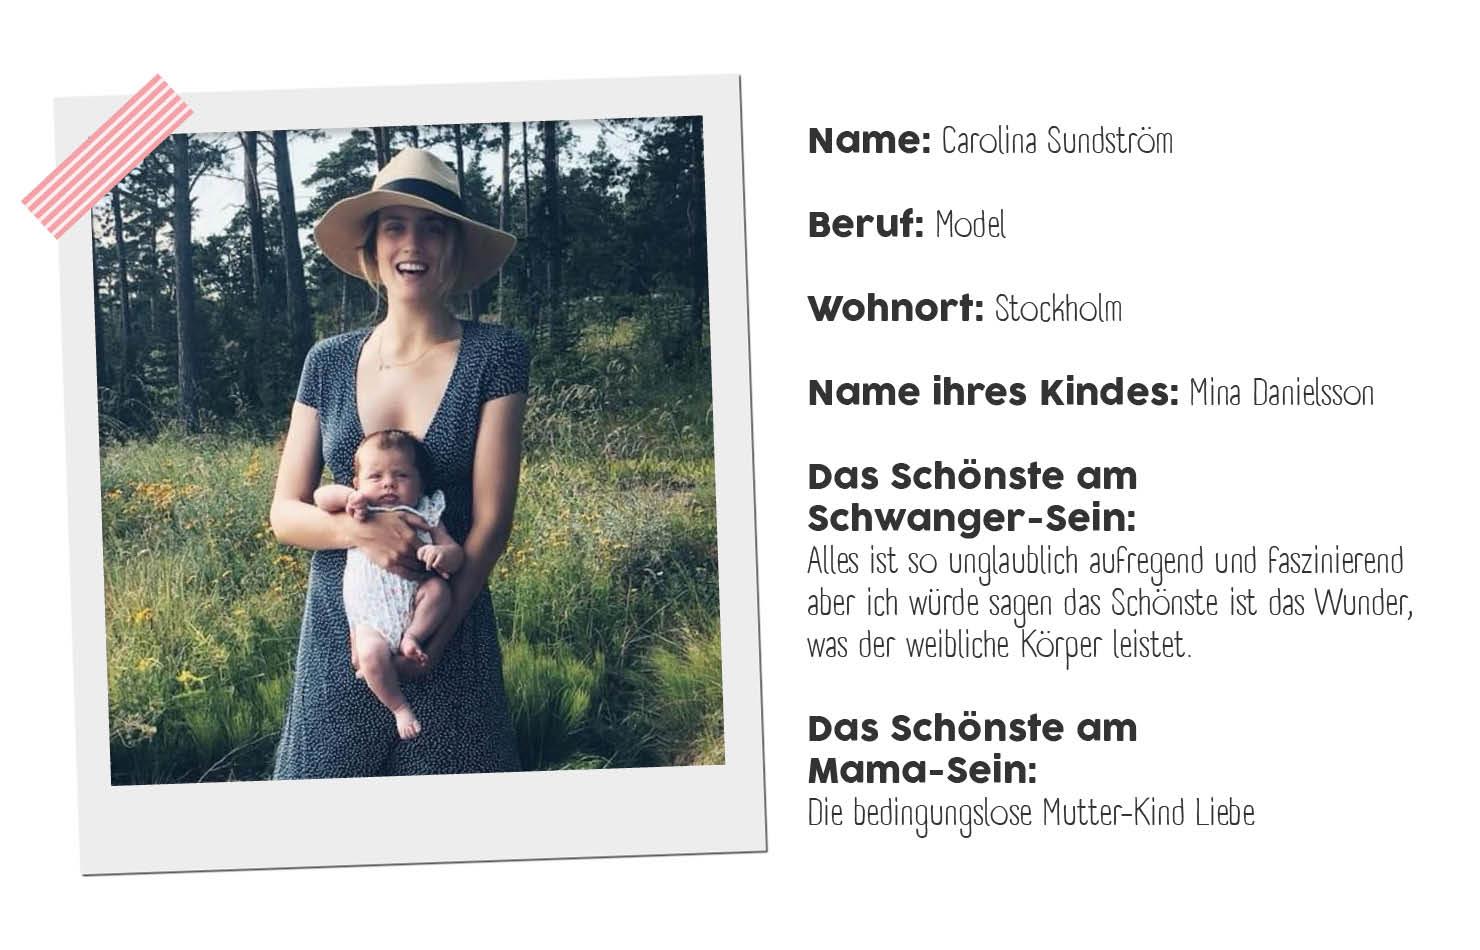 Schwangeres-Model-Umstandsmode-Umstandsbademode-Interview